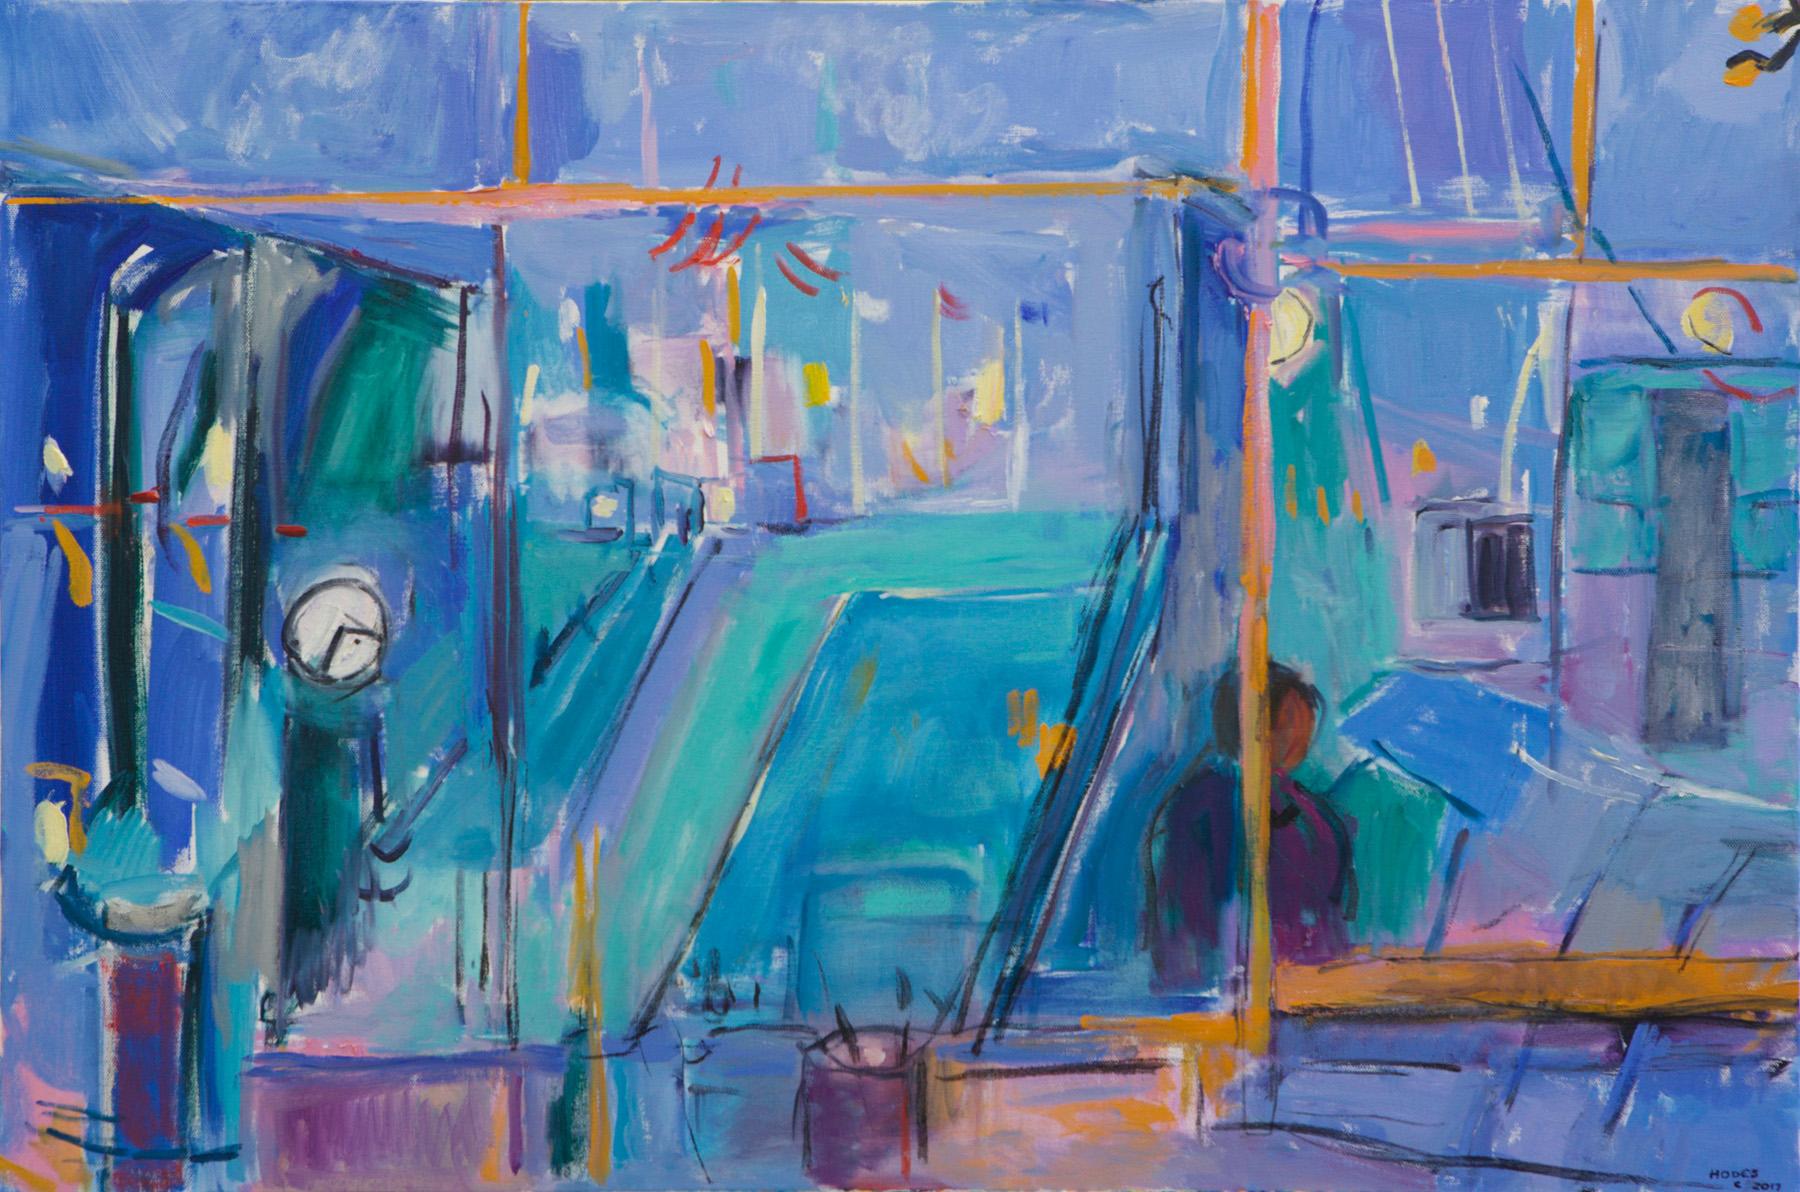 3194-Studio View in Blue-24x36